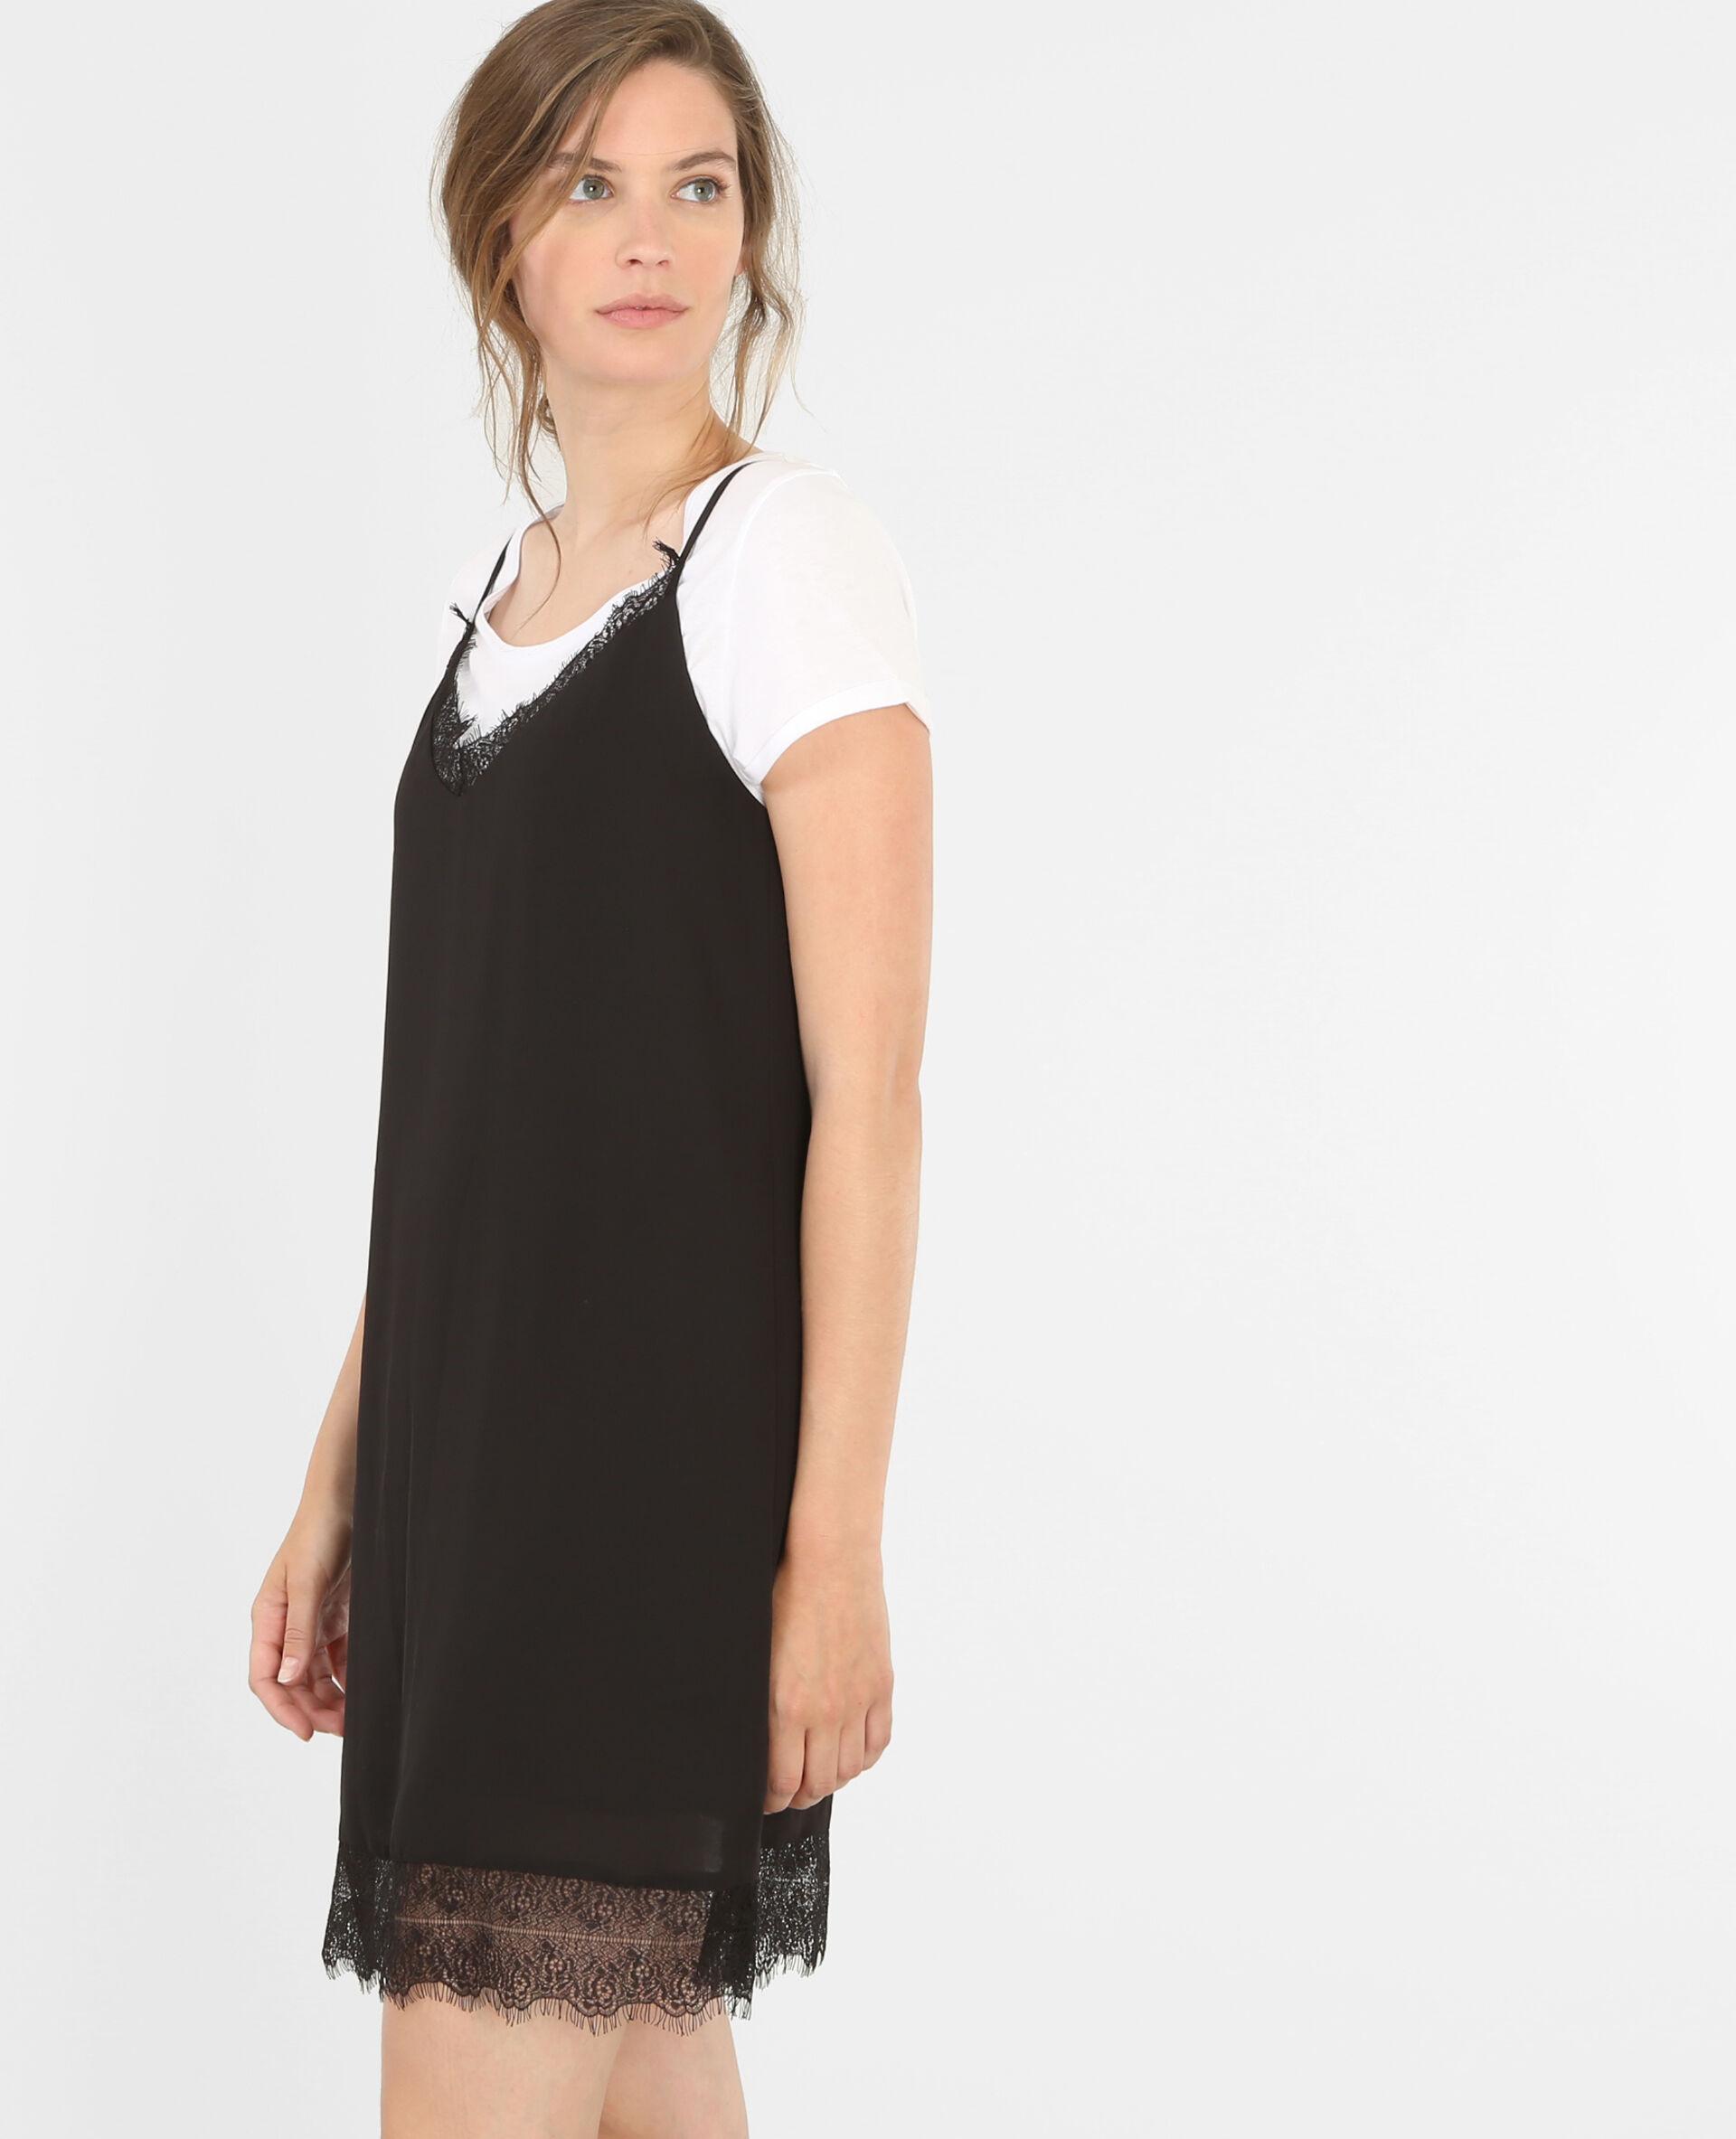 Petite robe noire esprit